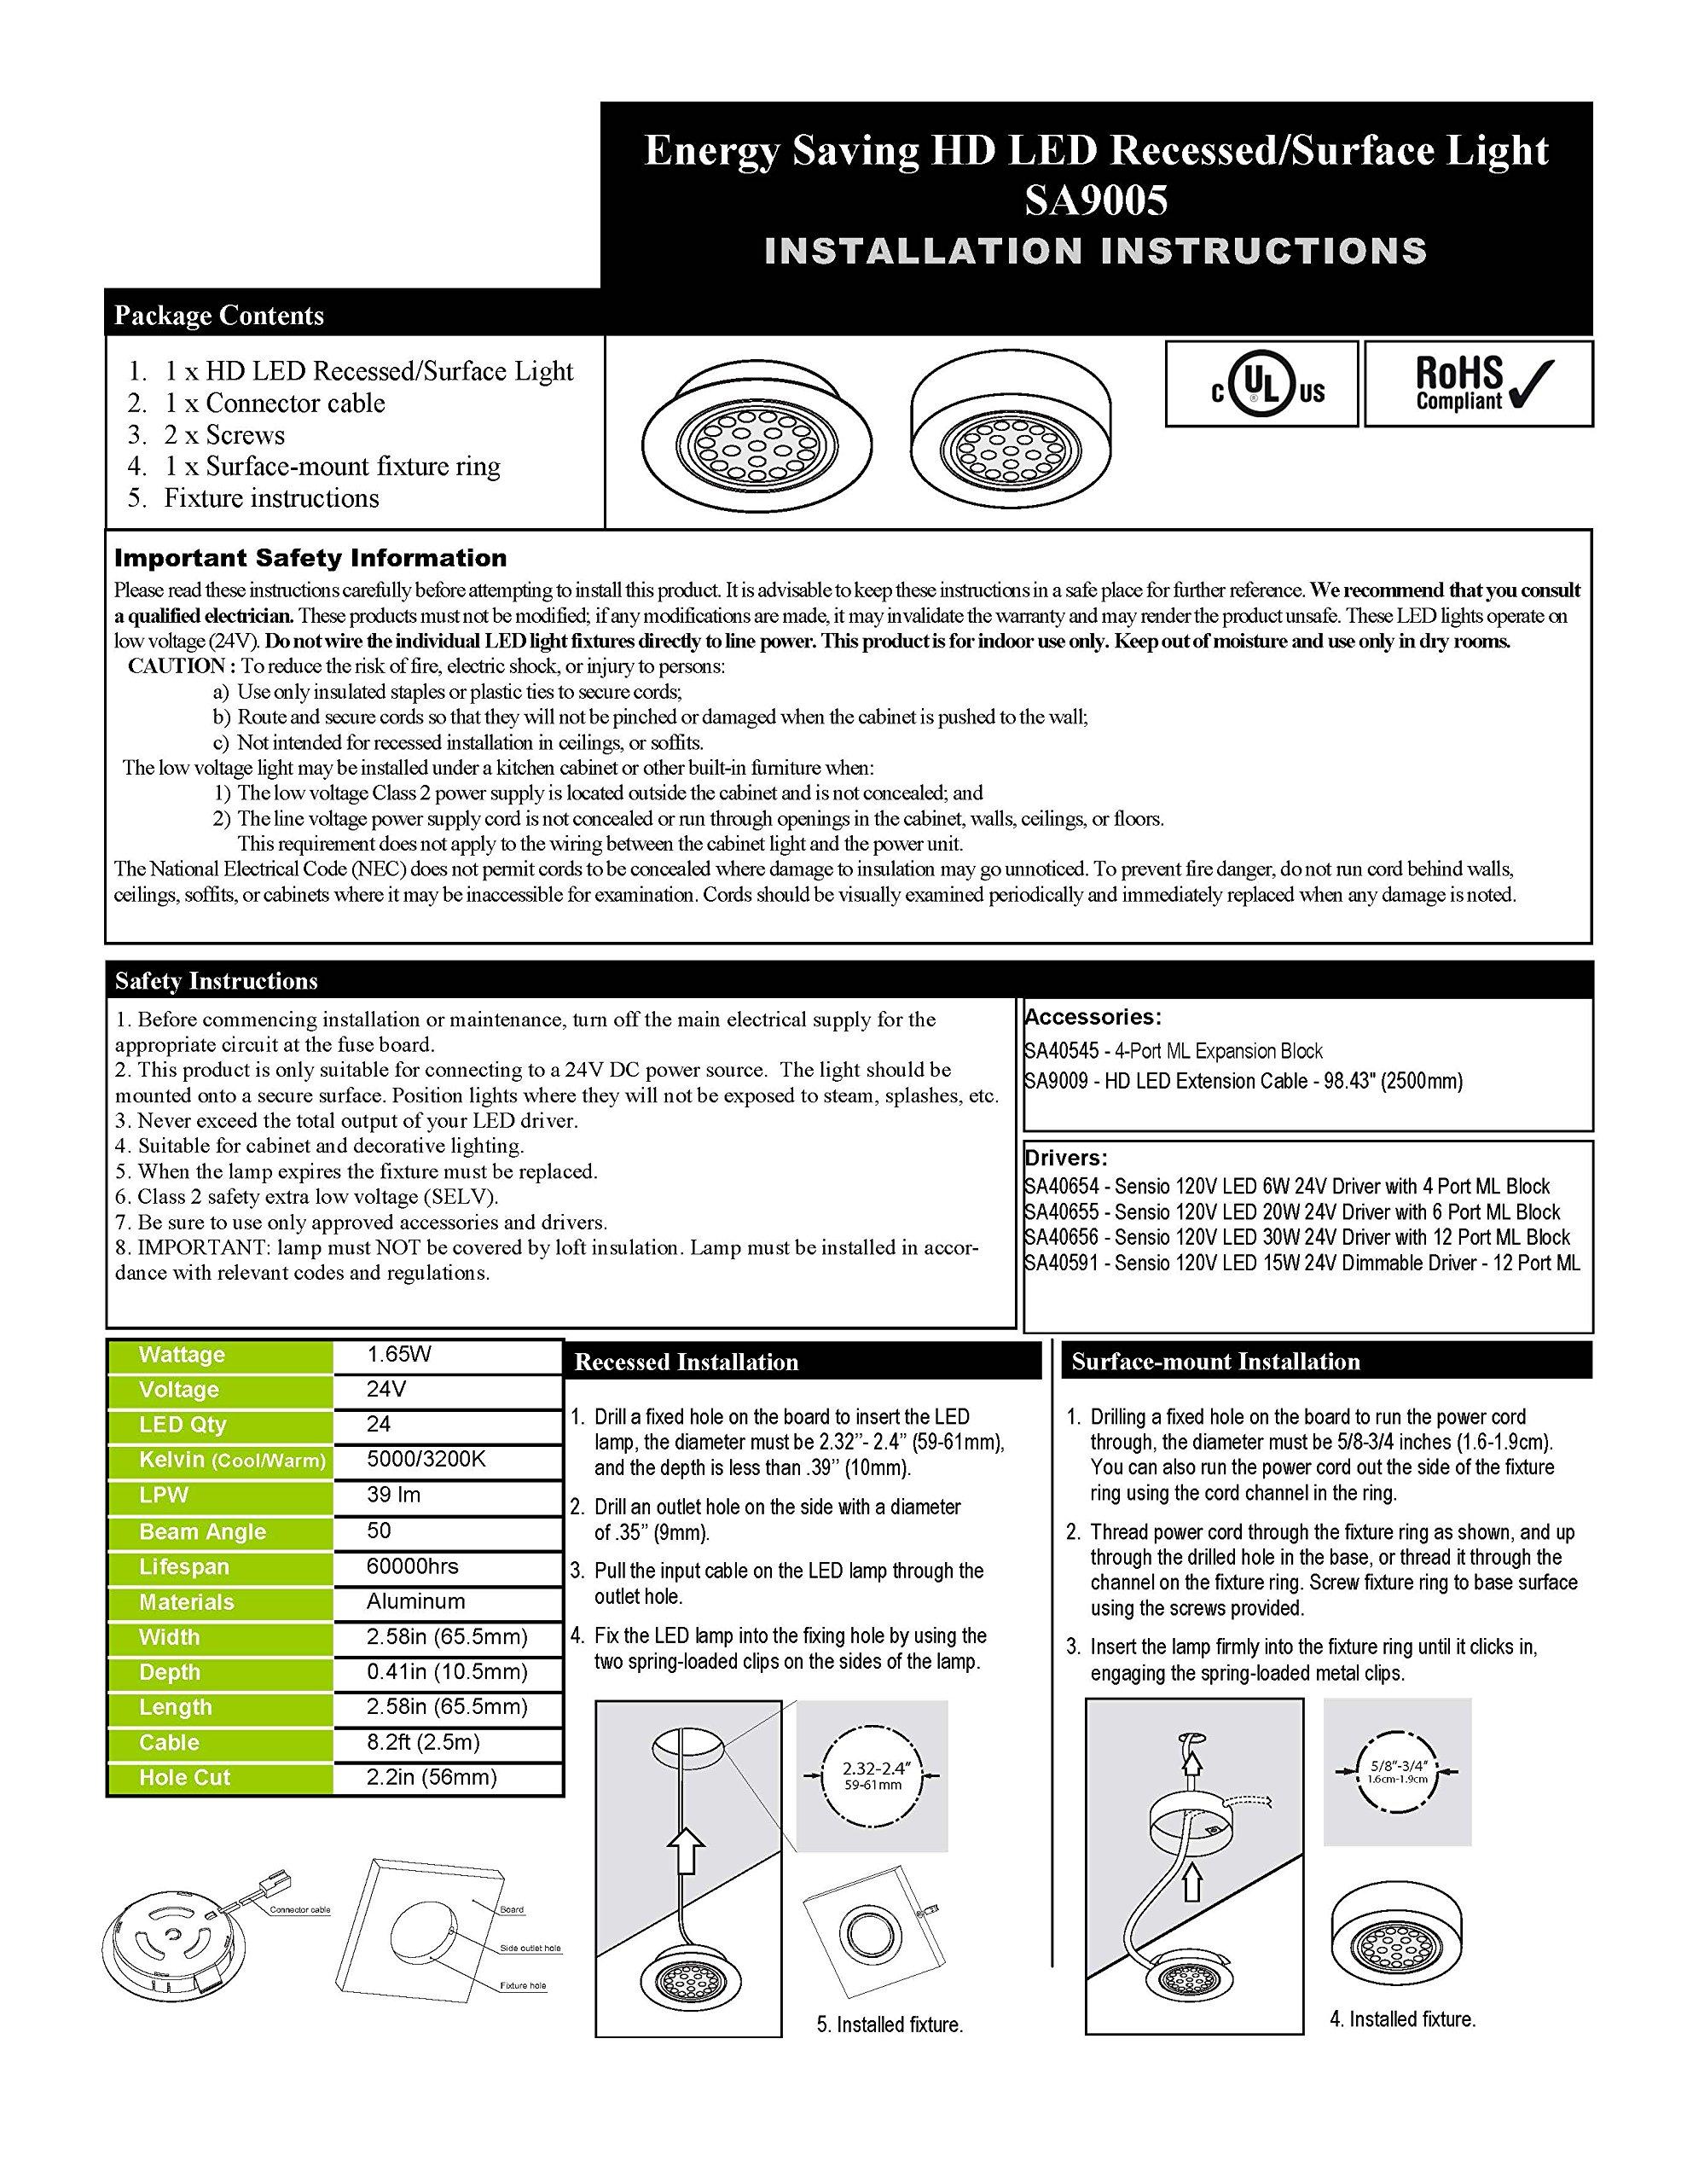 Transolid SA9005HDALWW Sensio HD LED 24V 1.65W Aluminum Recess-Surface Puck Light, Warm White